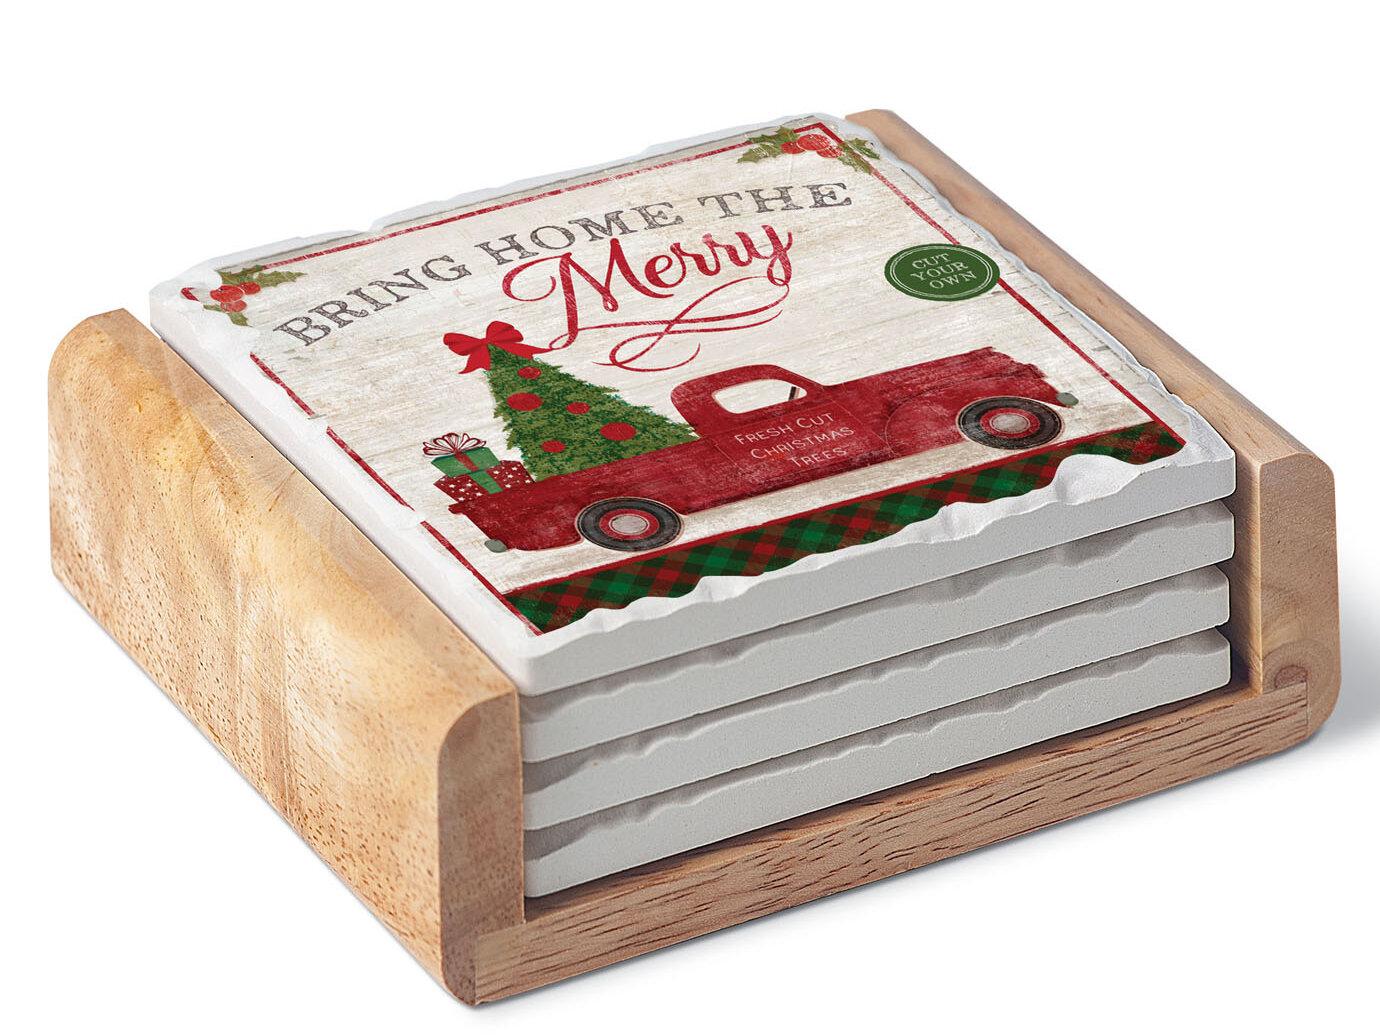 One Size Cork Backed CoasterStone Natural Christmas Set of 4 Coasters